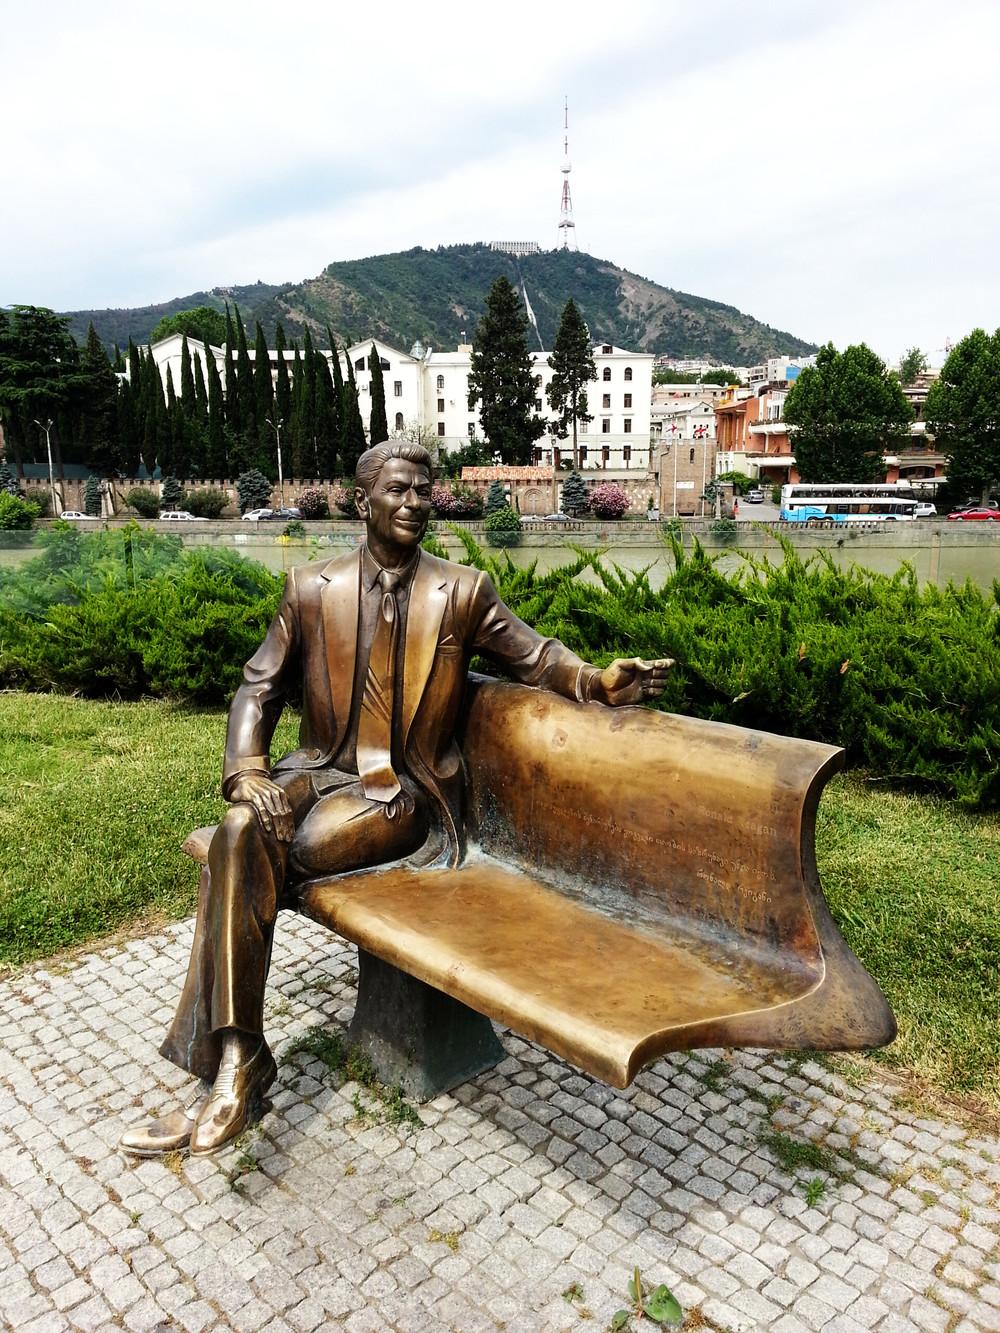 Ronald Reagan Statue in Tbilisi.